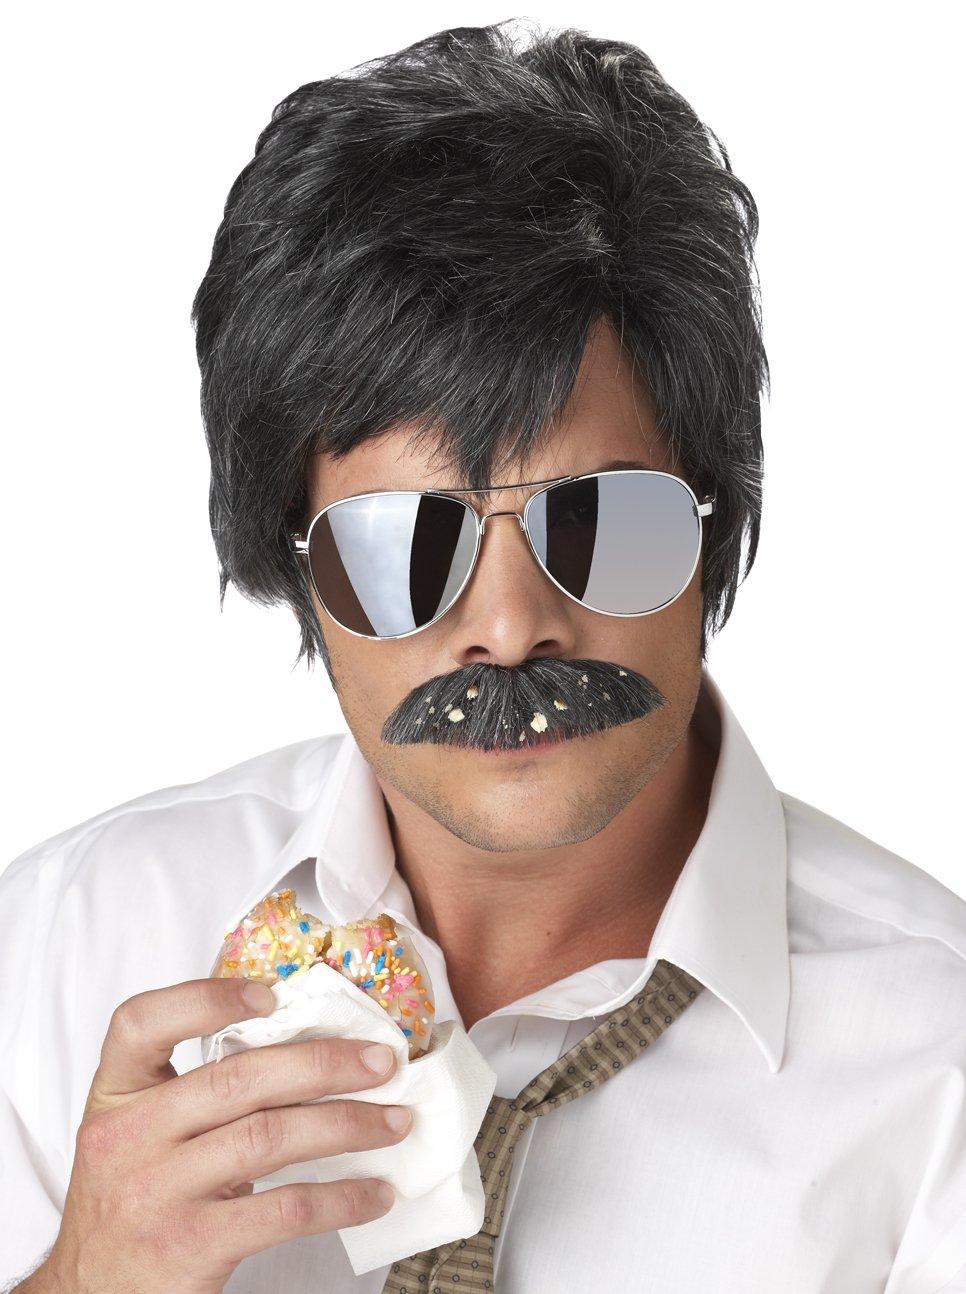 Ace Detective Reno Cop Jim Carrey Adult Costume Wig and Moustache #70644